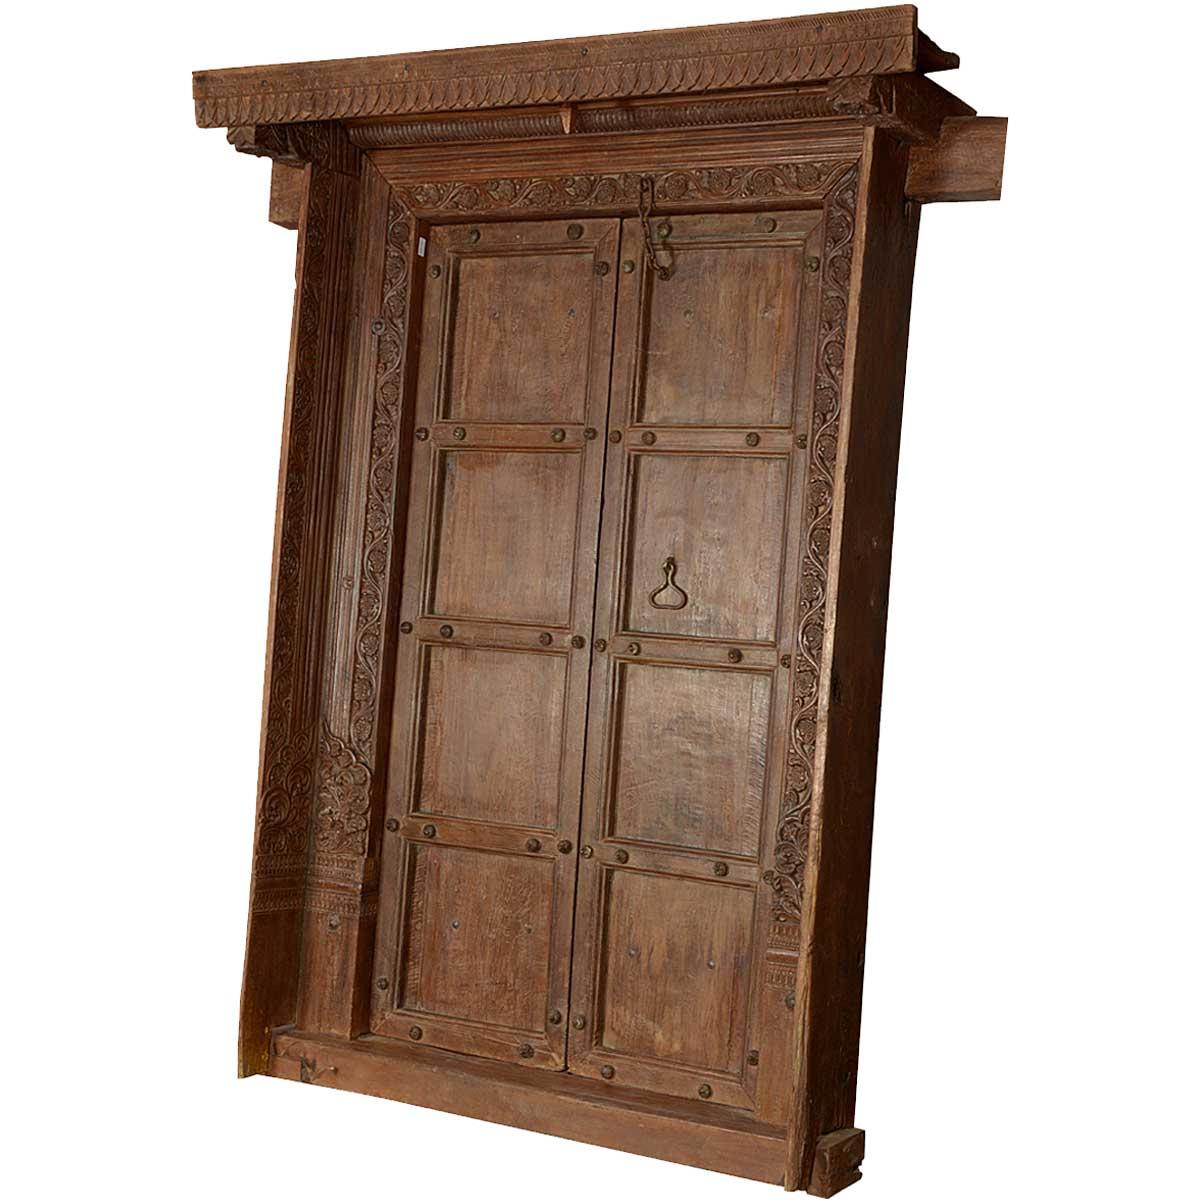 Tudor rose reclaimed wood 8 panel hand carved doors for Hand carved wood doors